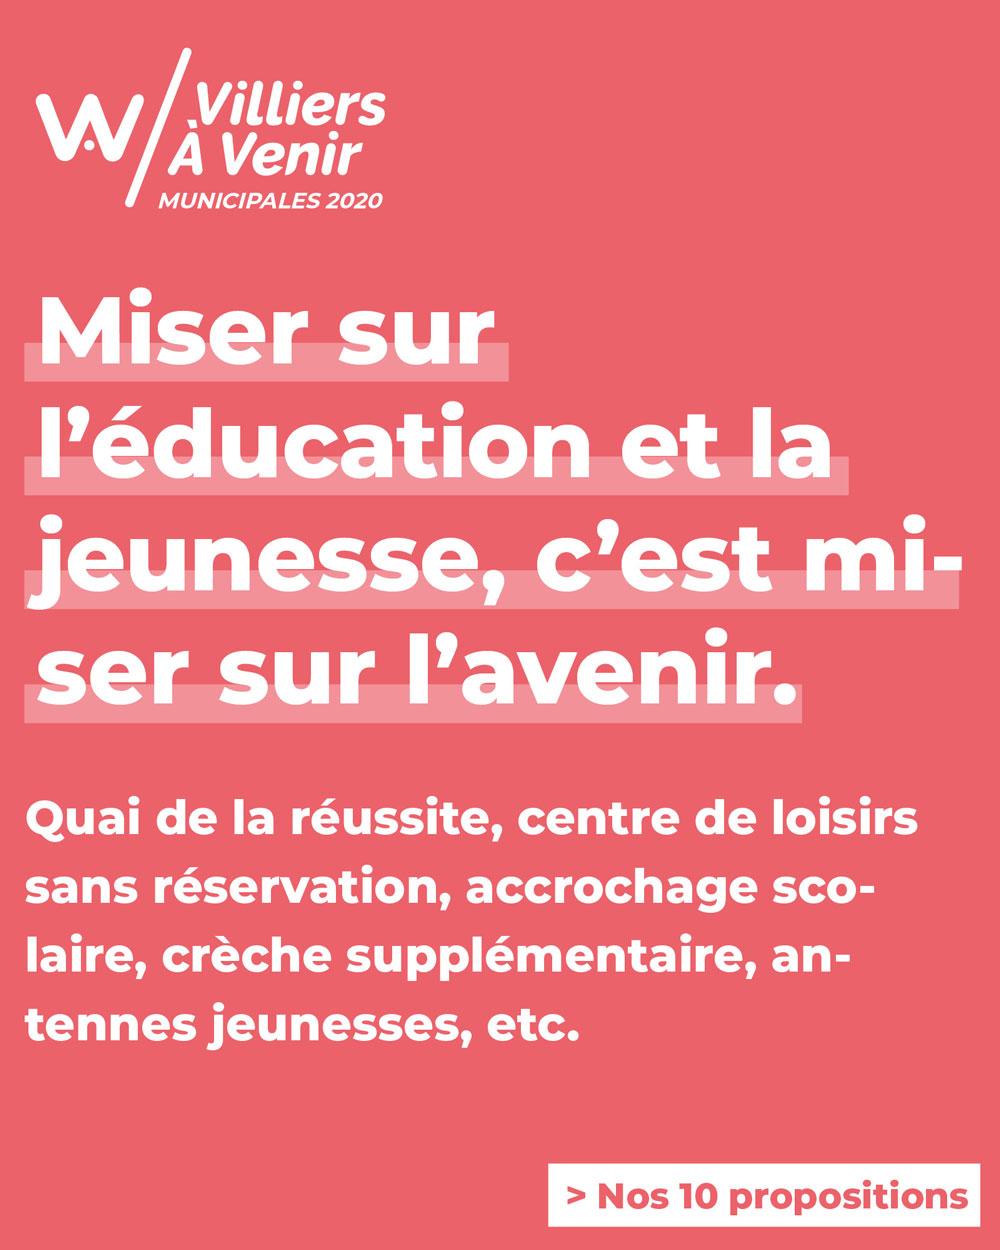 https://vav94.fr/wp-content/uploads/2020/02/PROGRAMME-VILLIERS-A-VENIR-VAV-94-EDUCATION-JEUNESSE-MUNICIPALES-2020-VILLIERS-SUR-MARNE.jpg